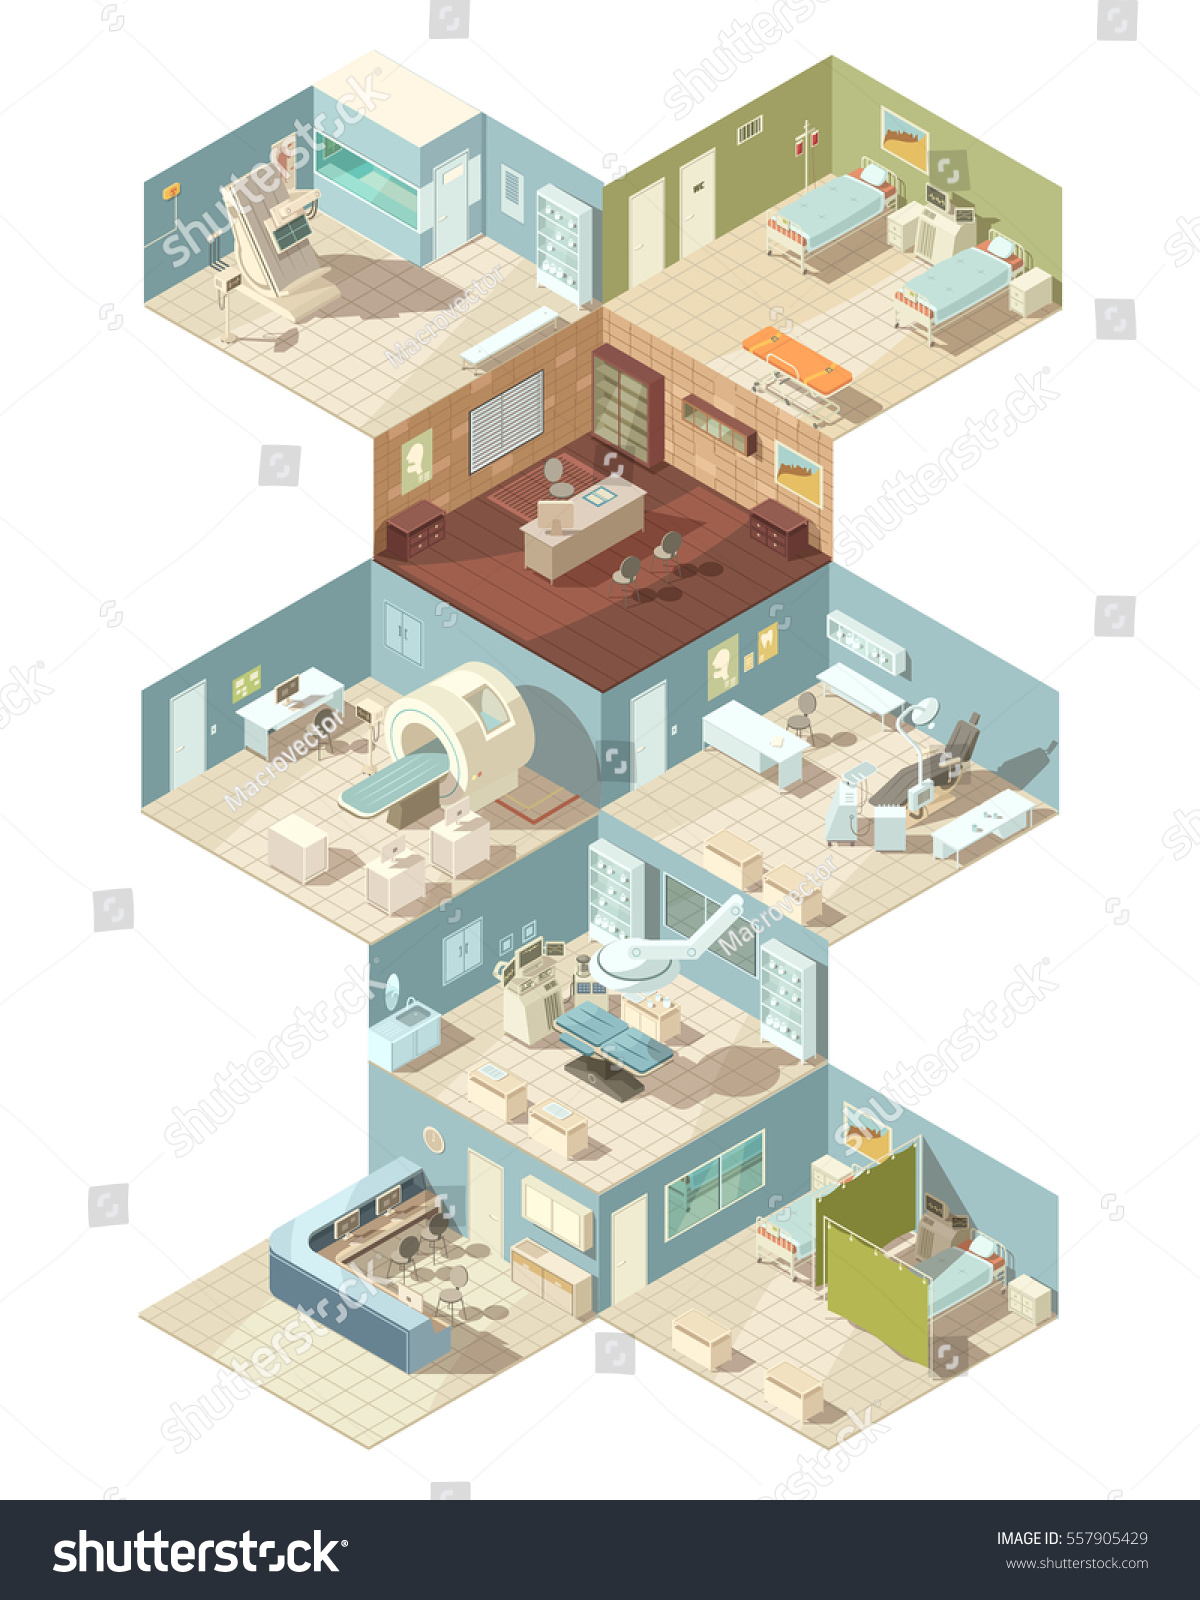 Operating Room Design: Hospital Indoors Isometric Design Concept Set Stock Vector